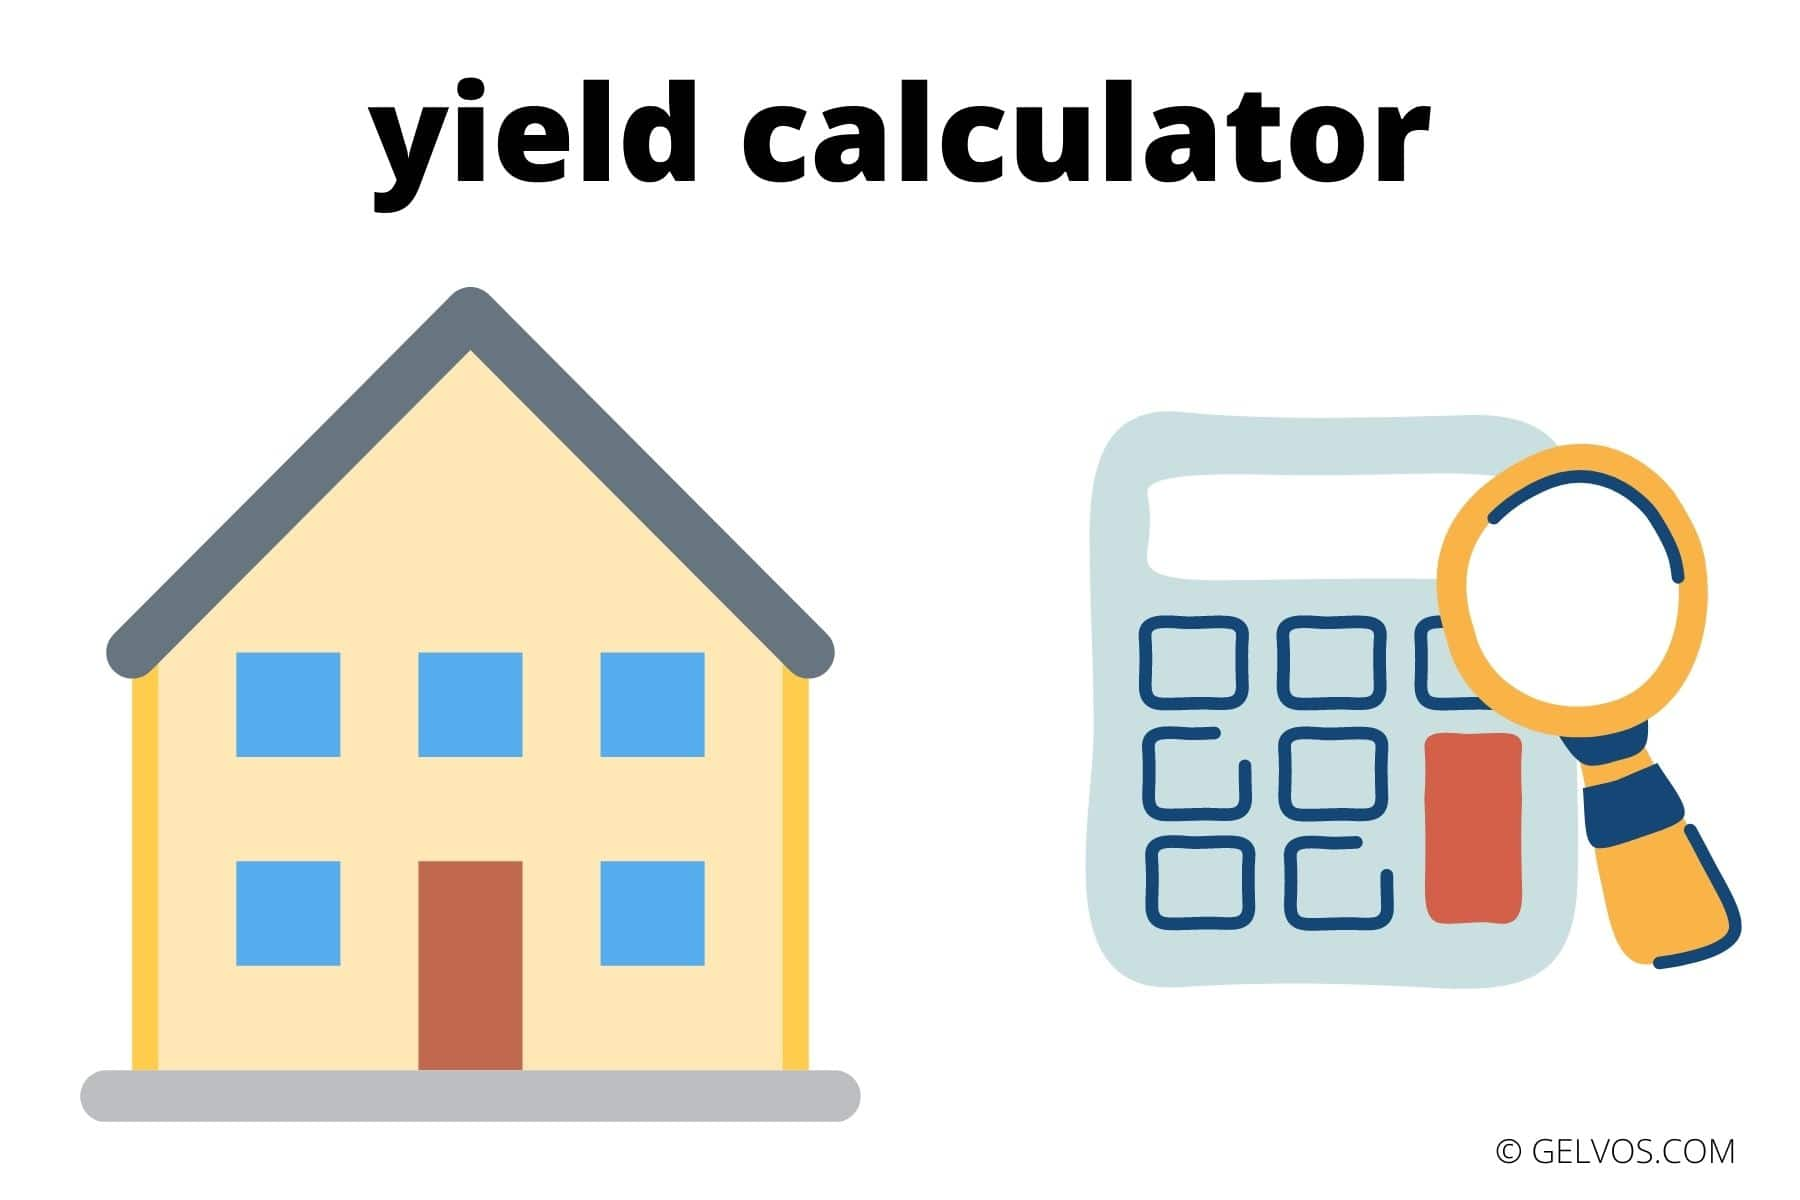 Yield calculator